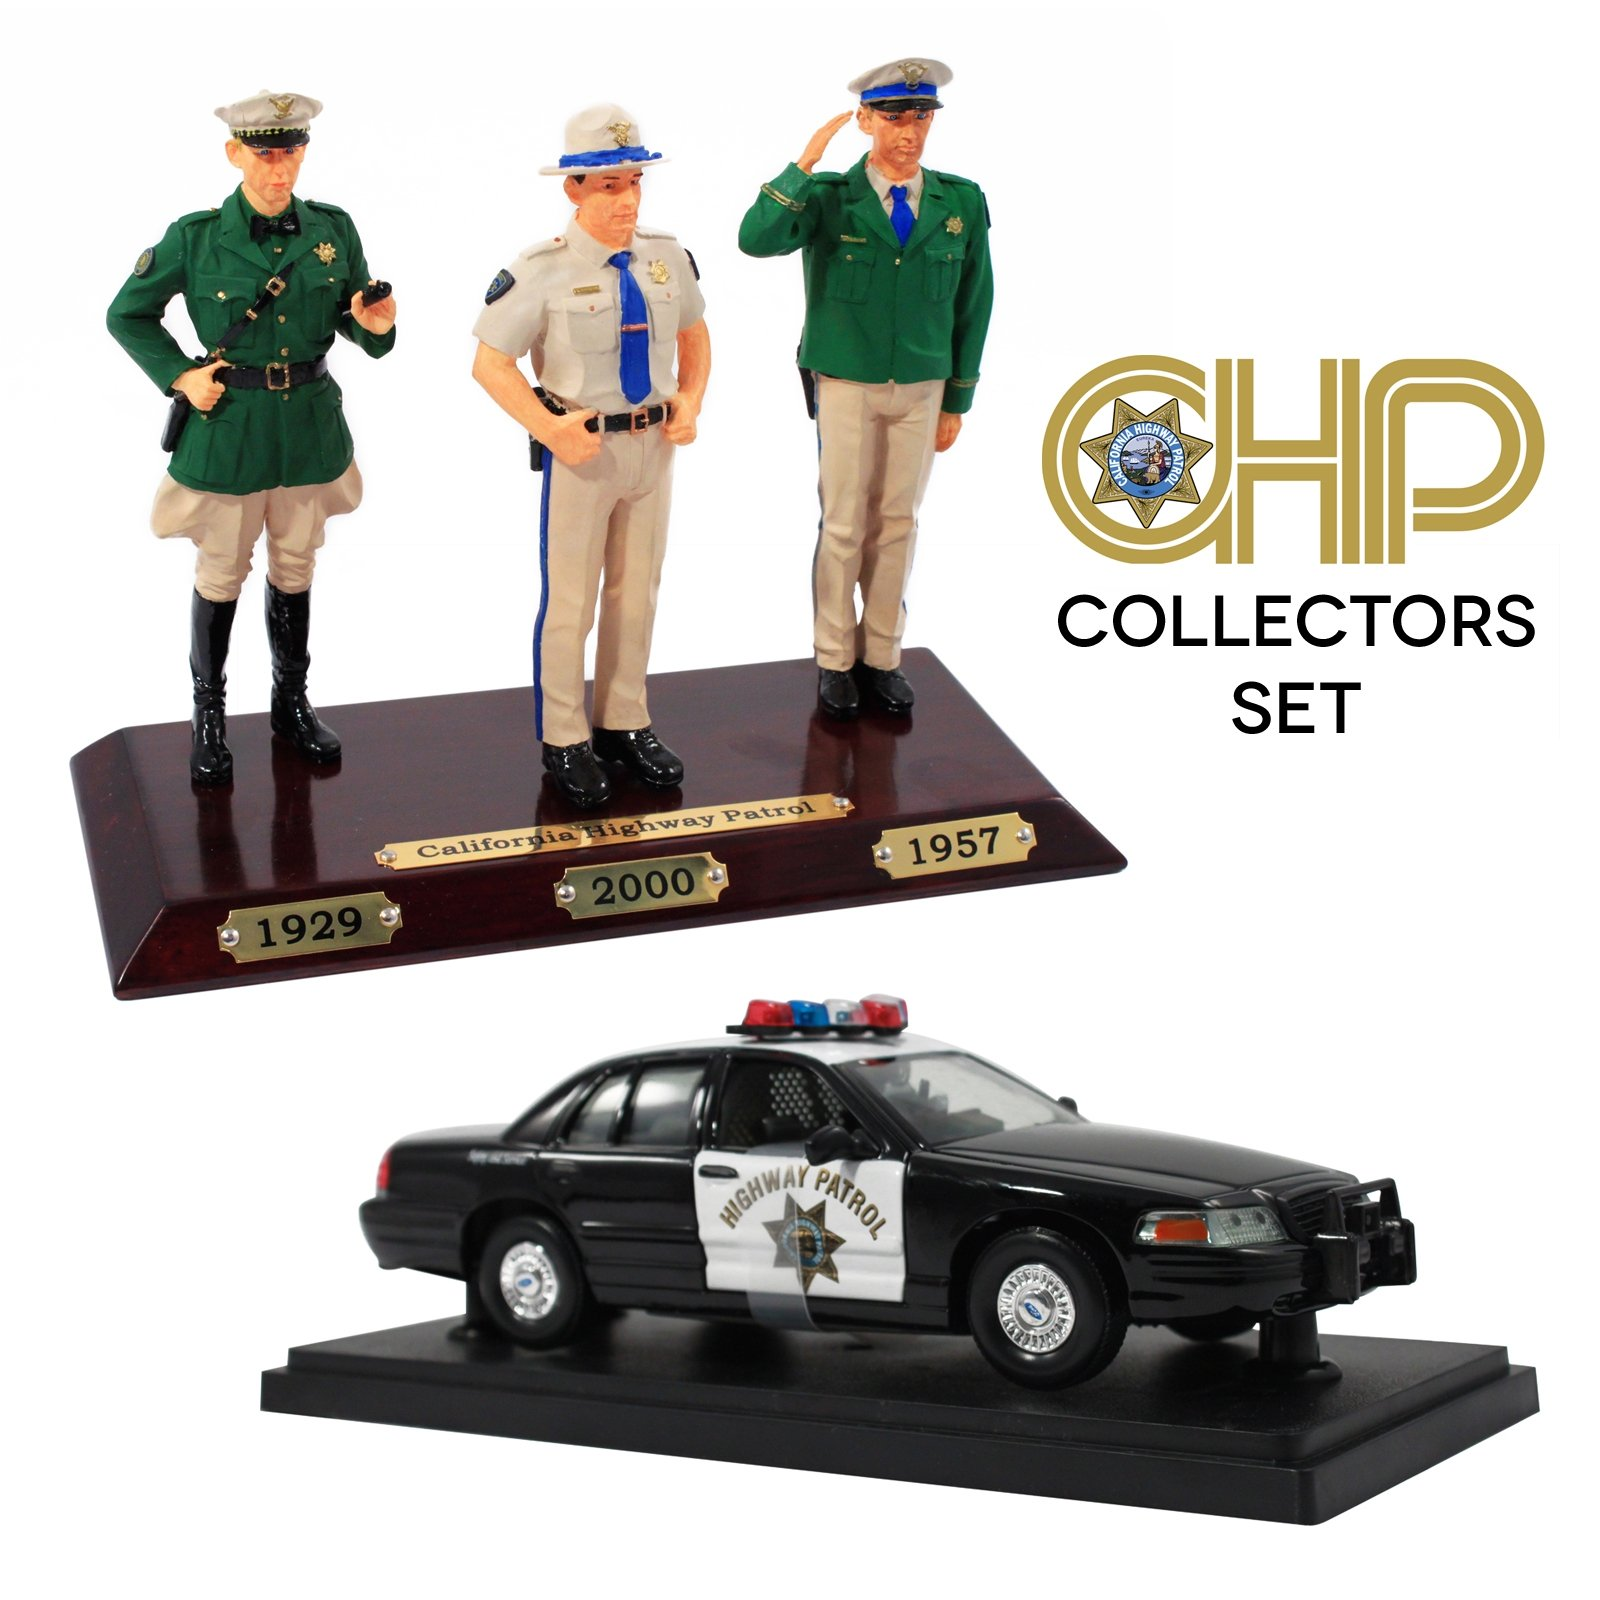 Collectible California Highway Patrol Police Car Replica & Figure Set